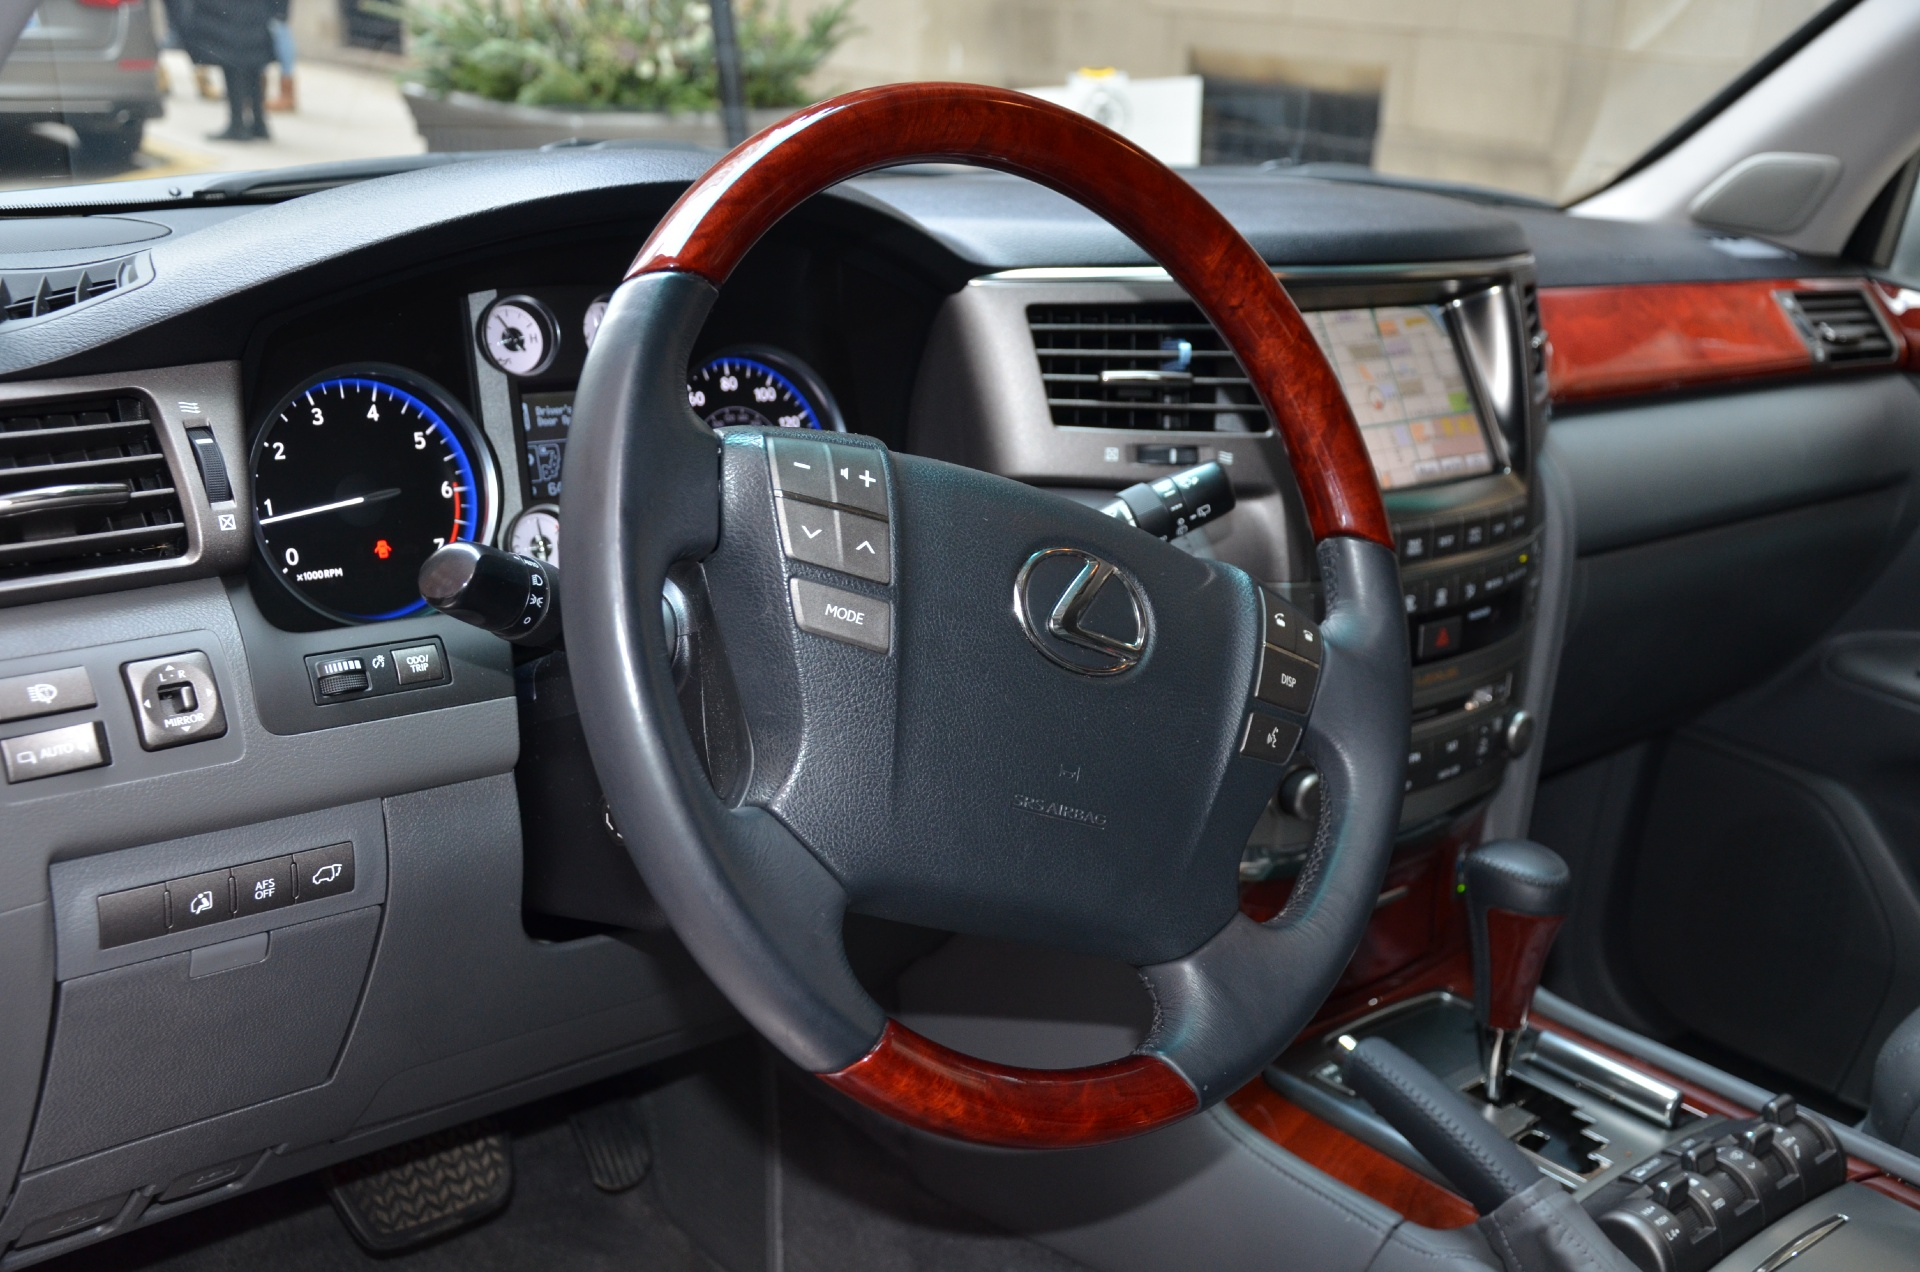 2010 Lexus LX 570 Stock GC1858 for sale near Chicago IL